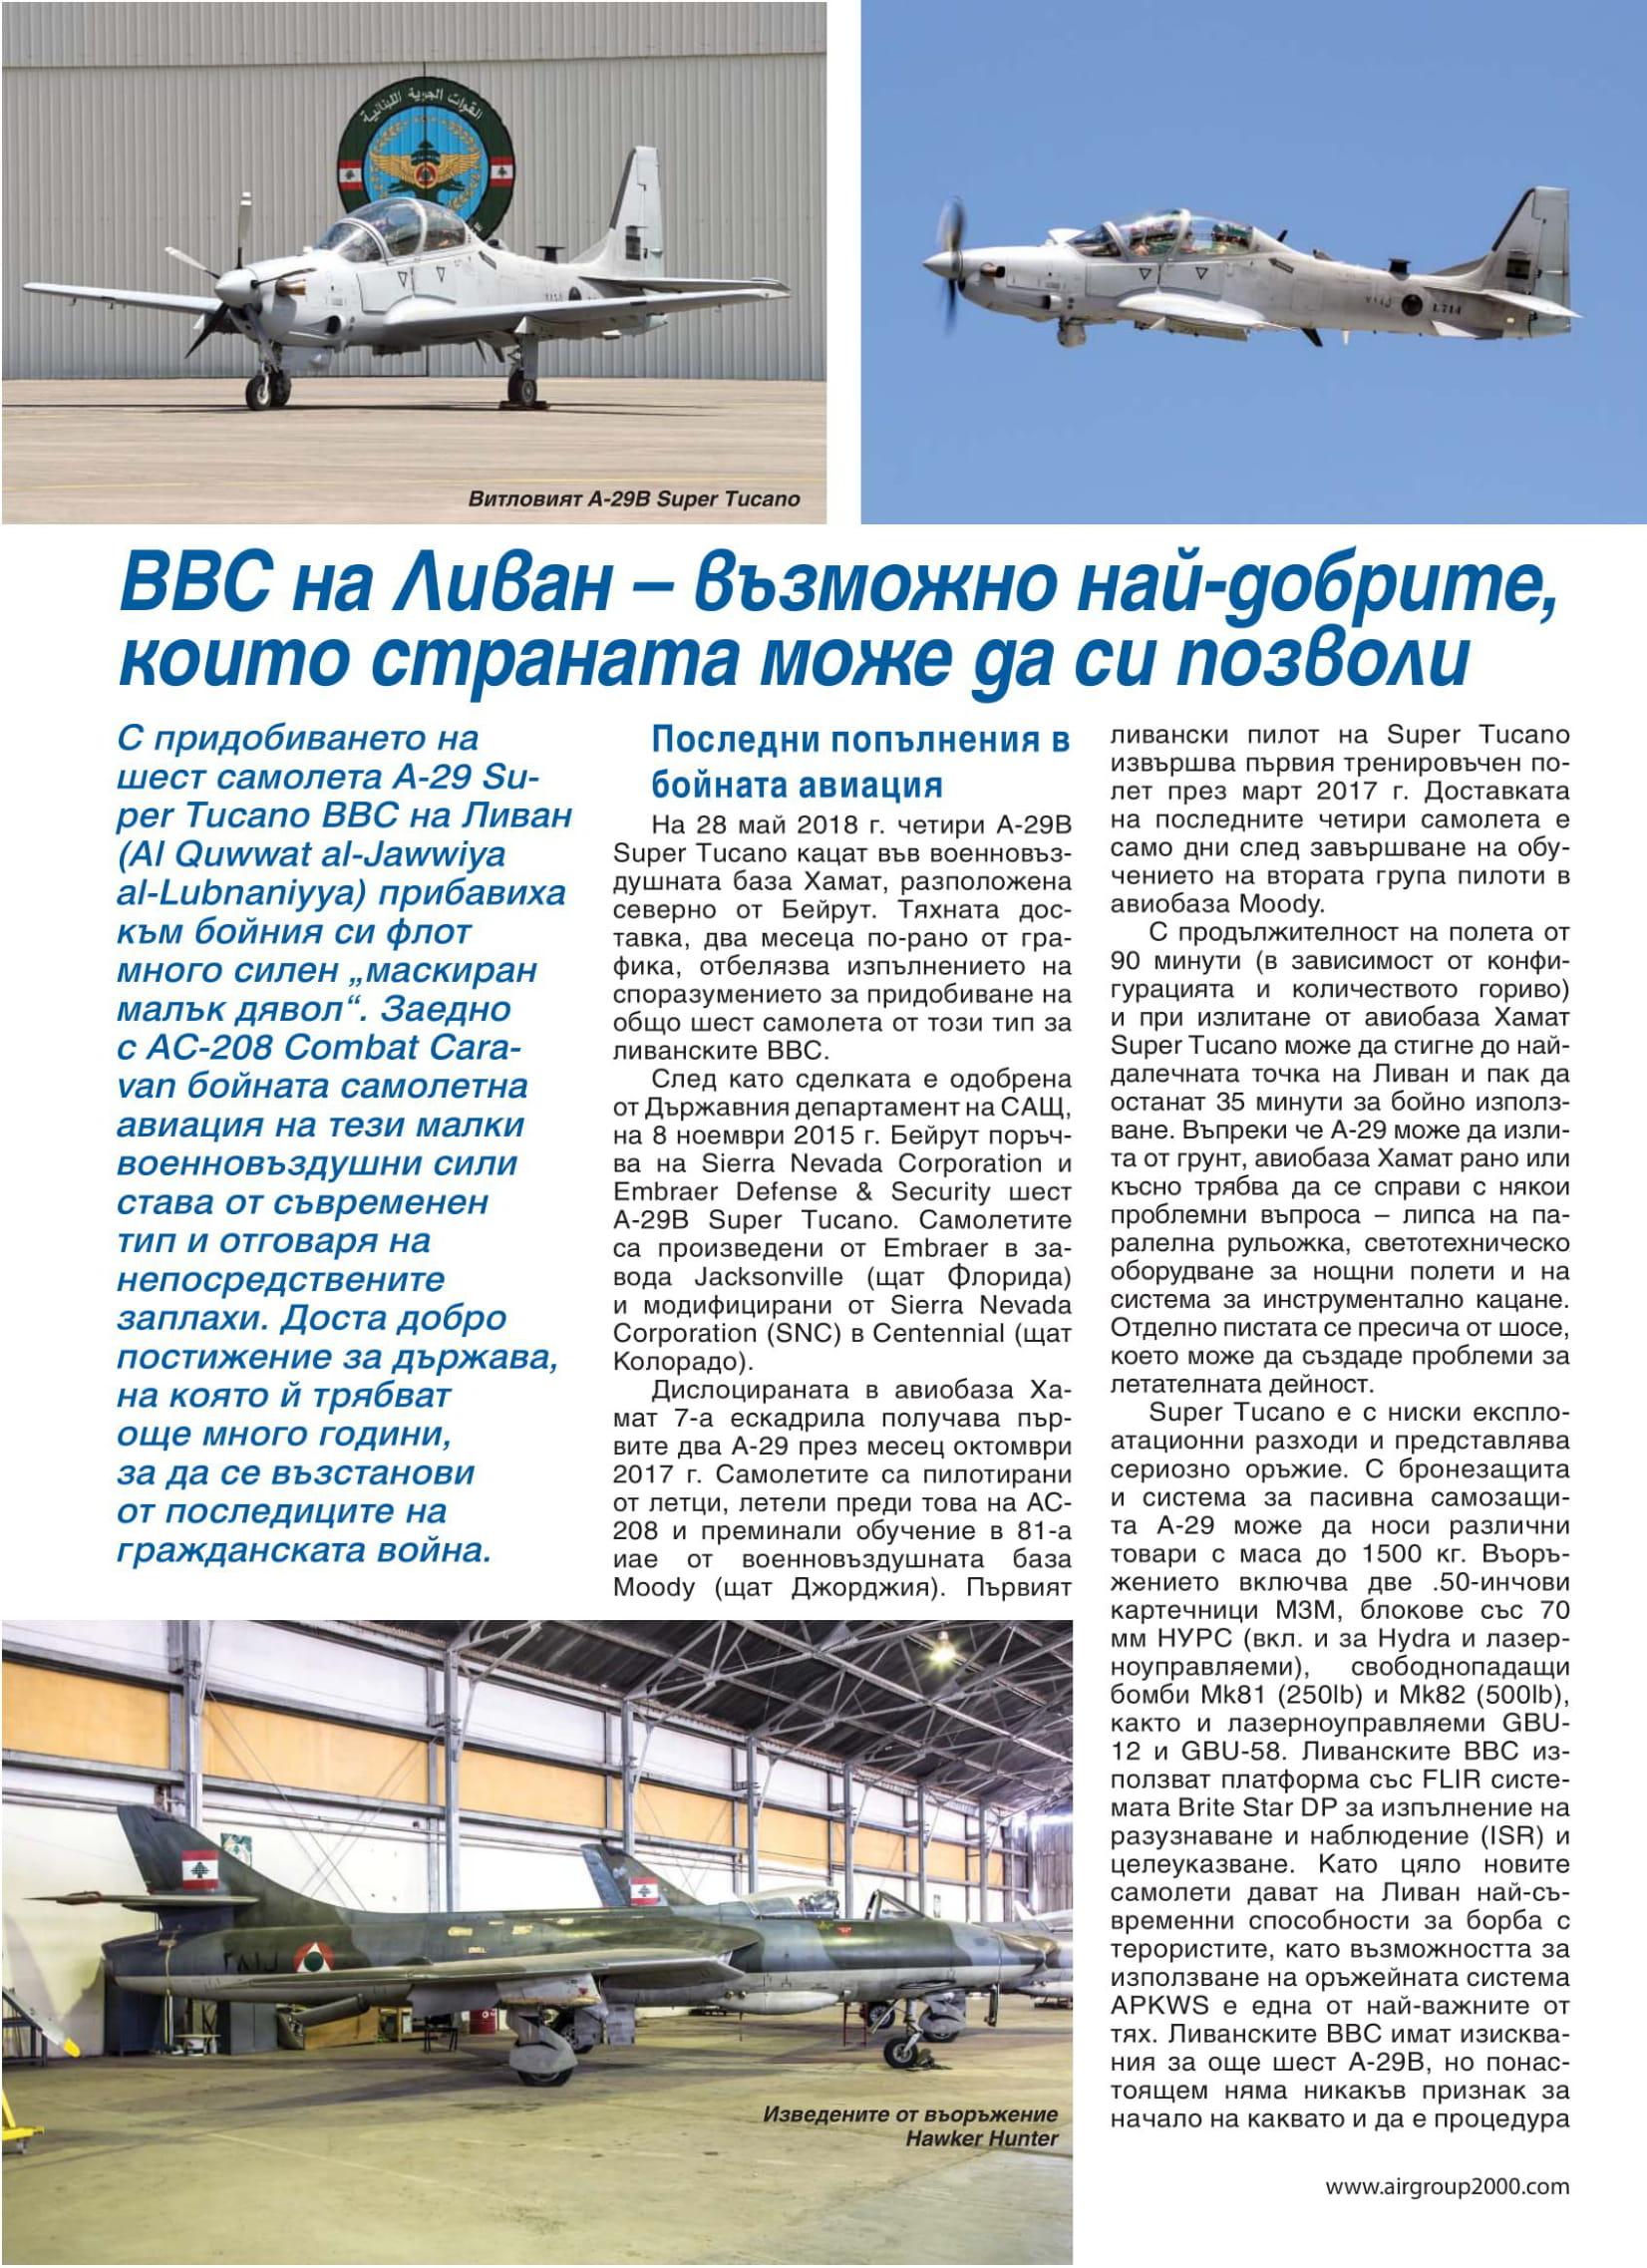 Club Wings (Bulgaria)_Lebanese Air Force (part 1)-2